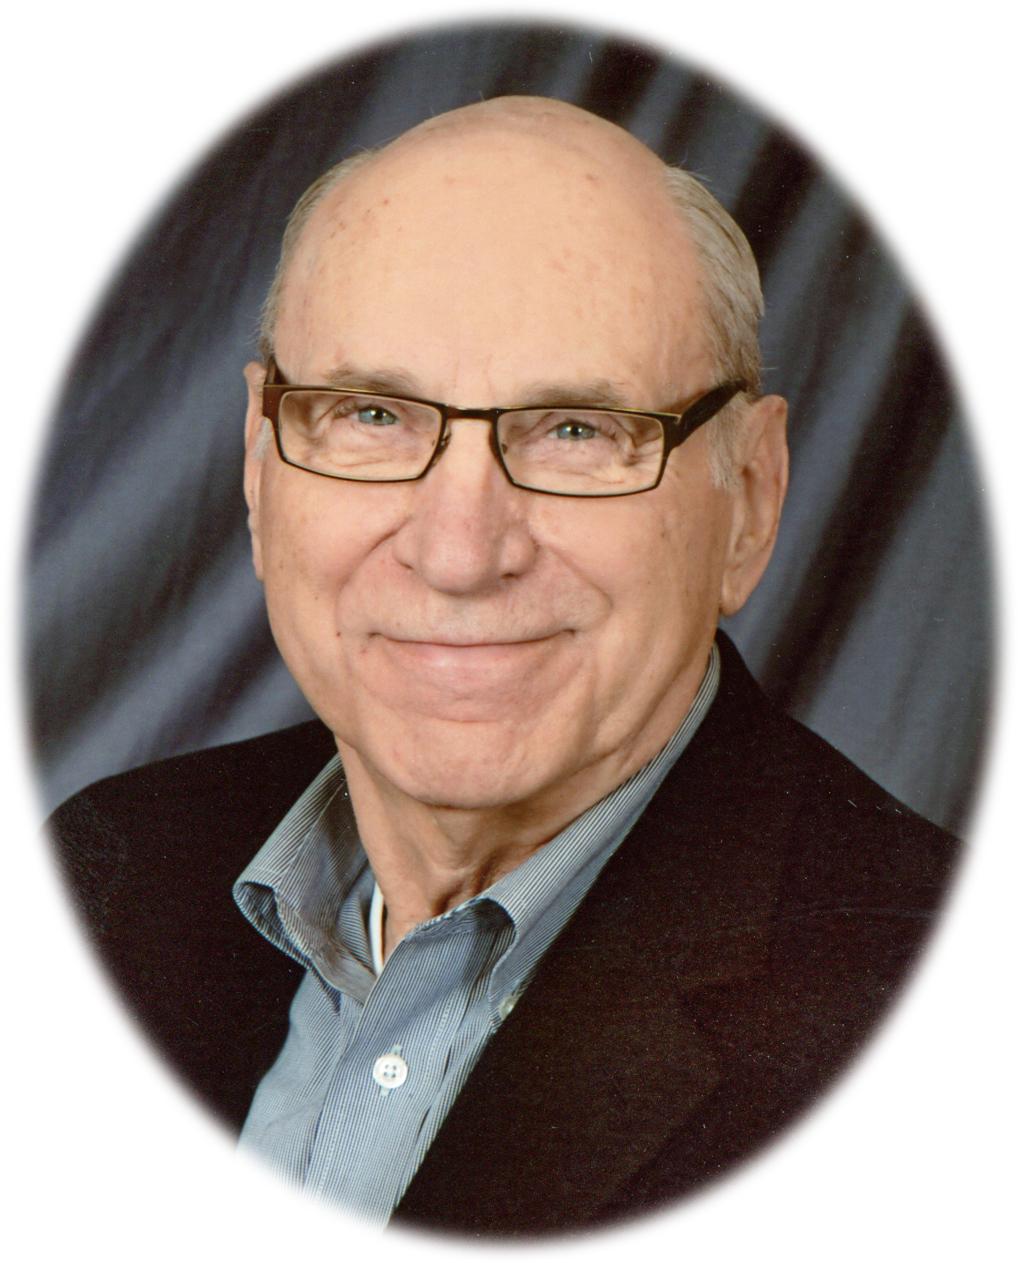 Daniel A. Classen